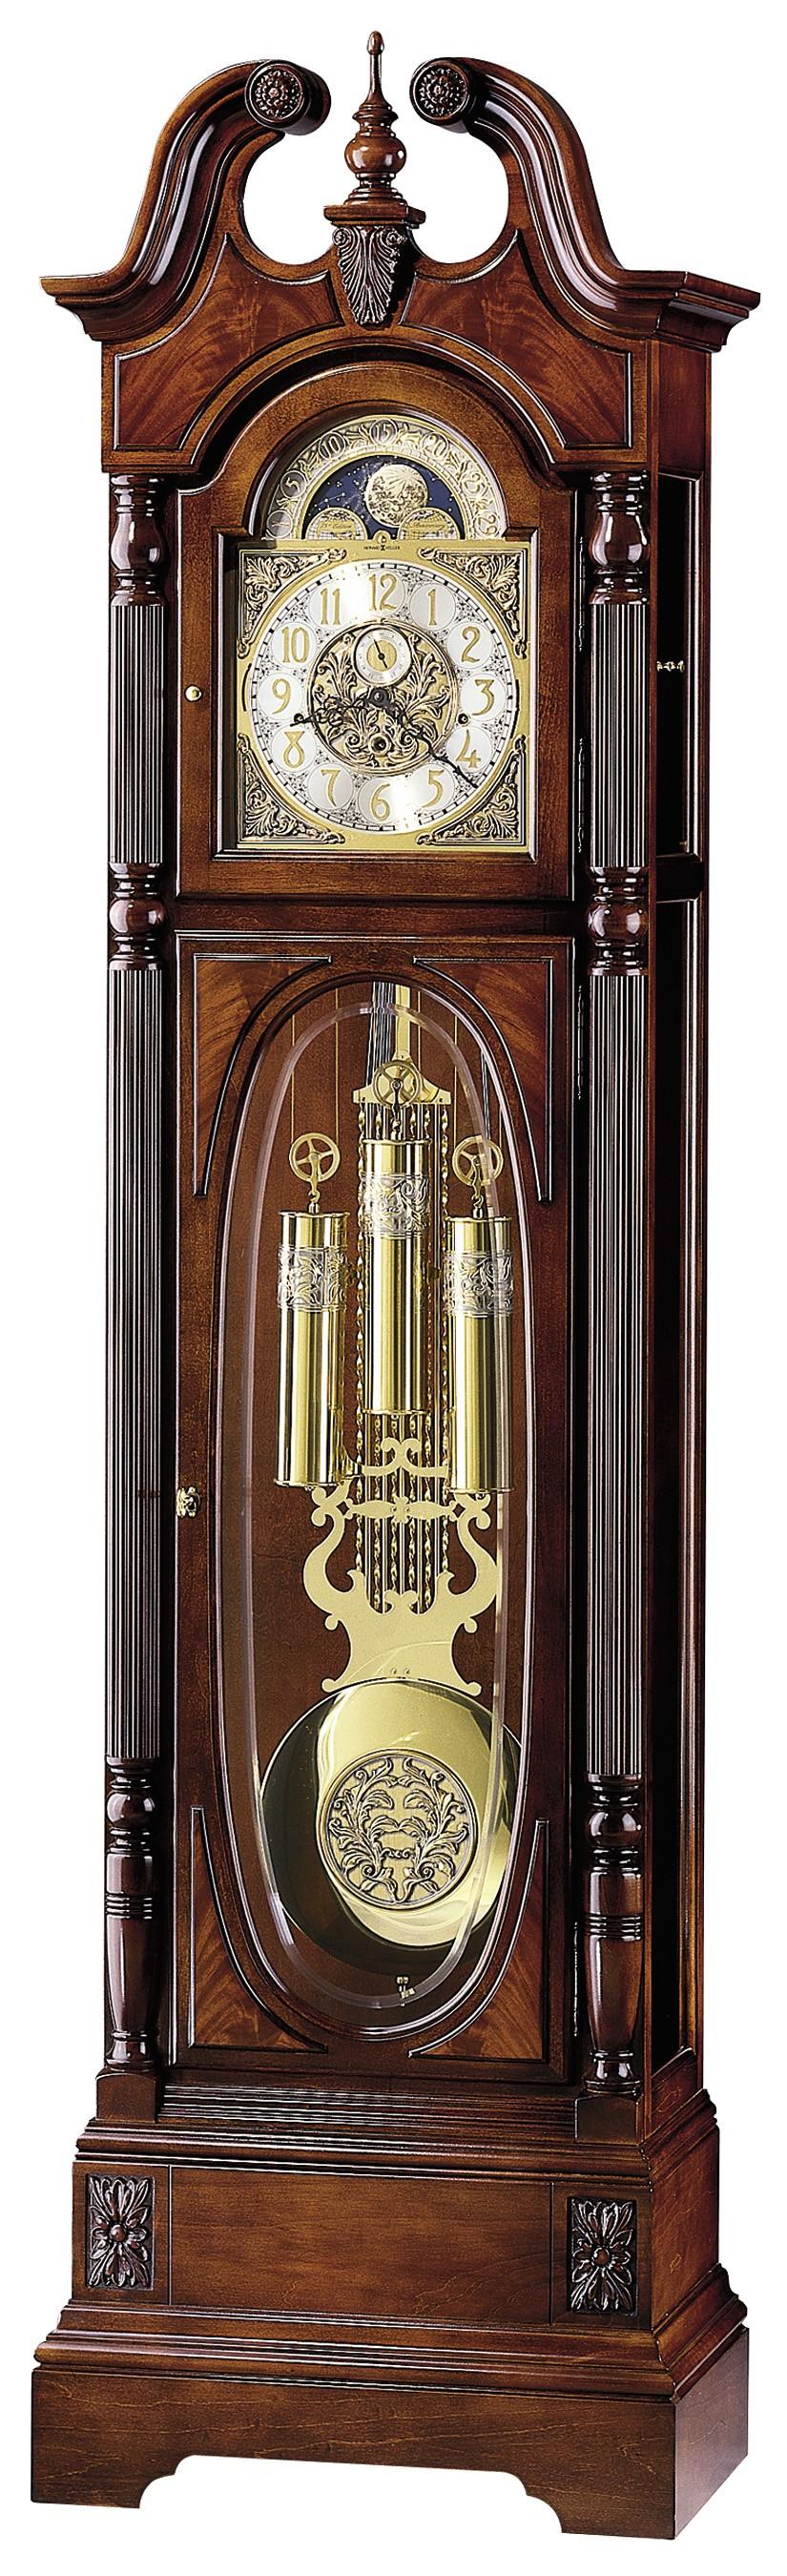 Howard Miller Clocks Howard Miller Stewart 610 948 Grandfather Clock Grandfather Clock Clock Antique Wall Clock